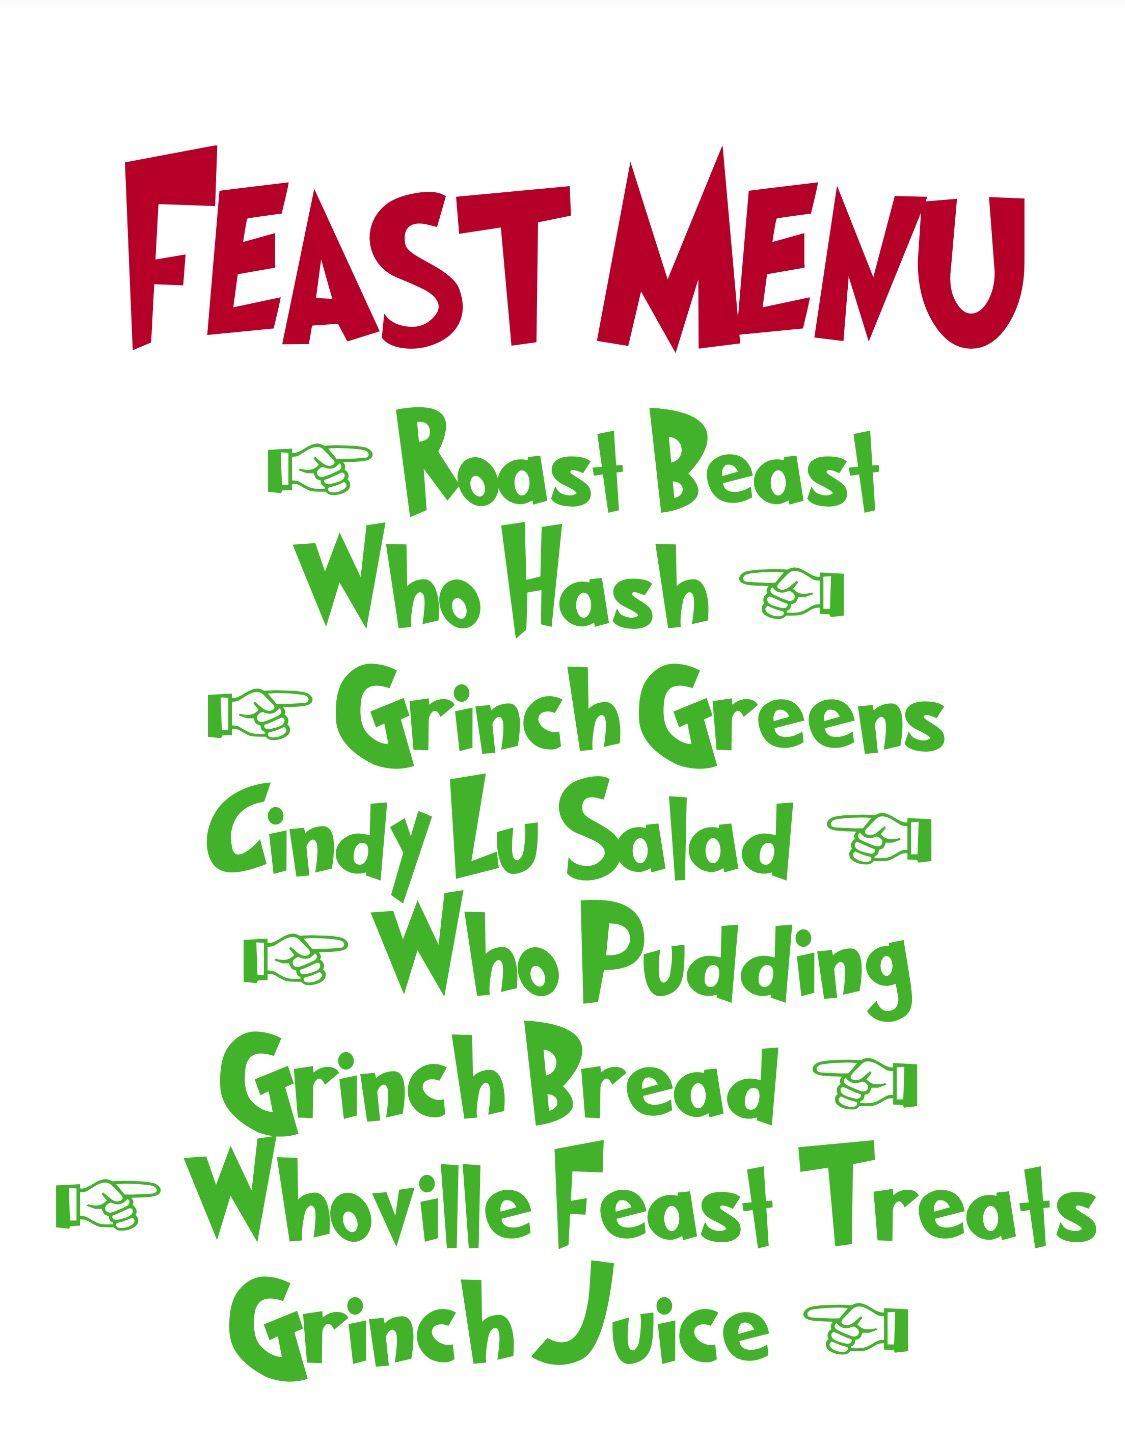 Dr Seuss The Grinch Who Stole Christmas Poem.Dr Seuss How The Grinch Stole Christmas Lunch Dinner Menu